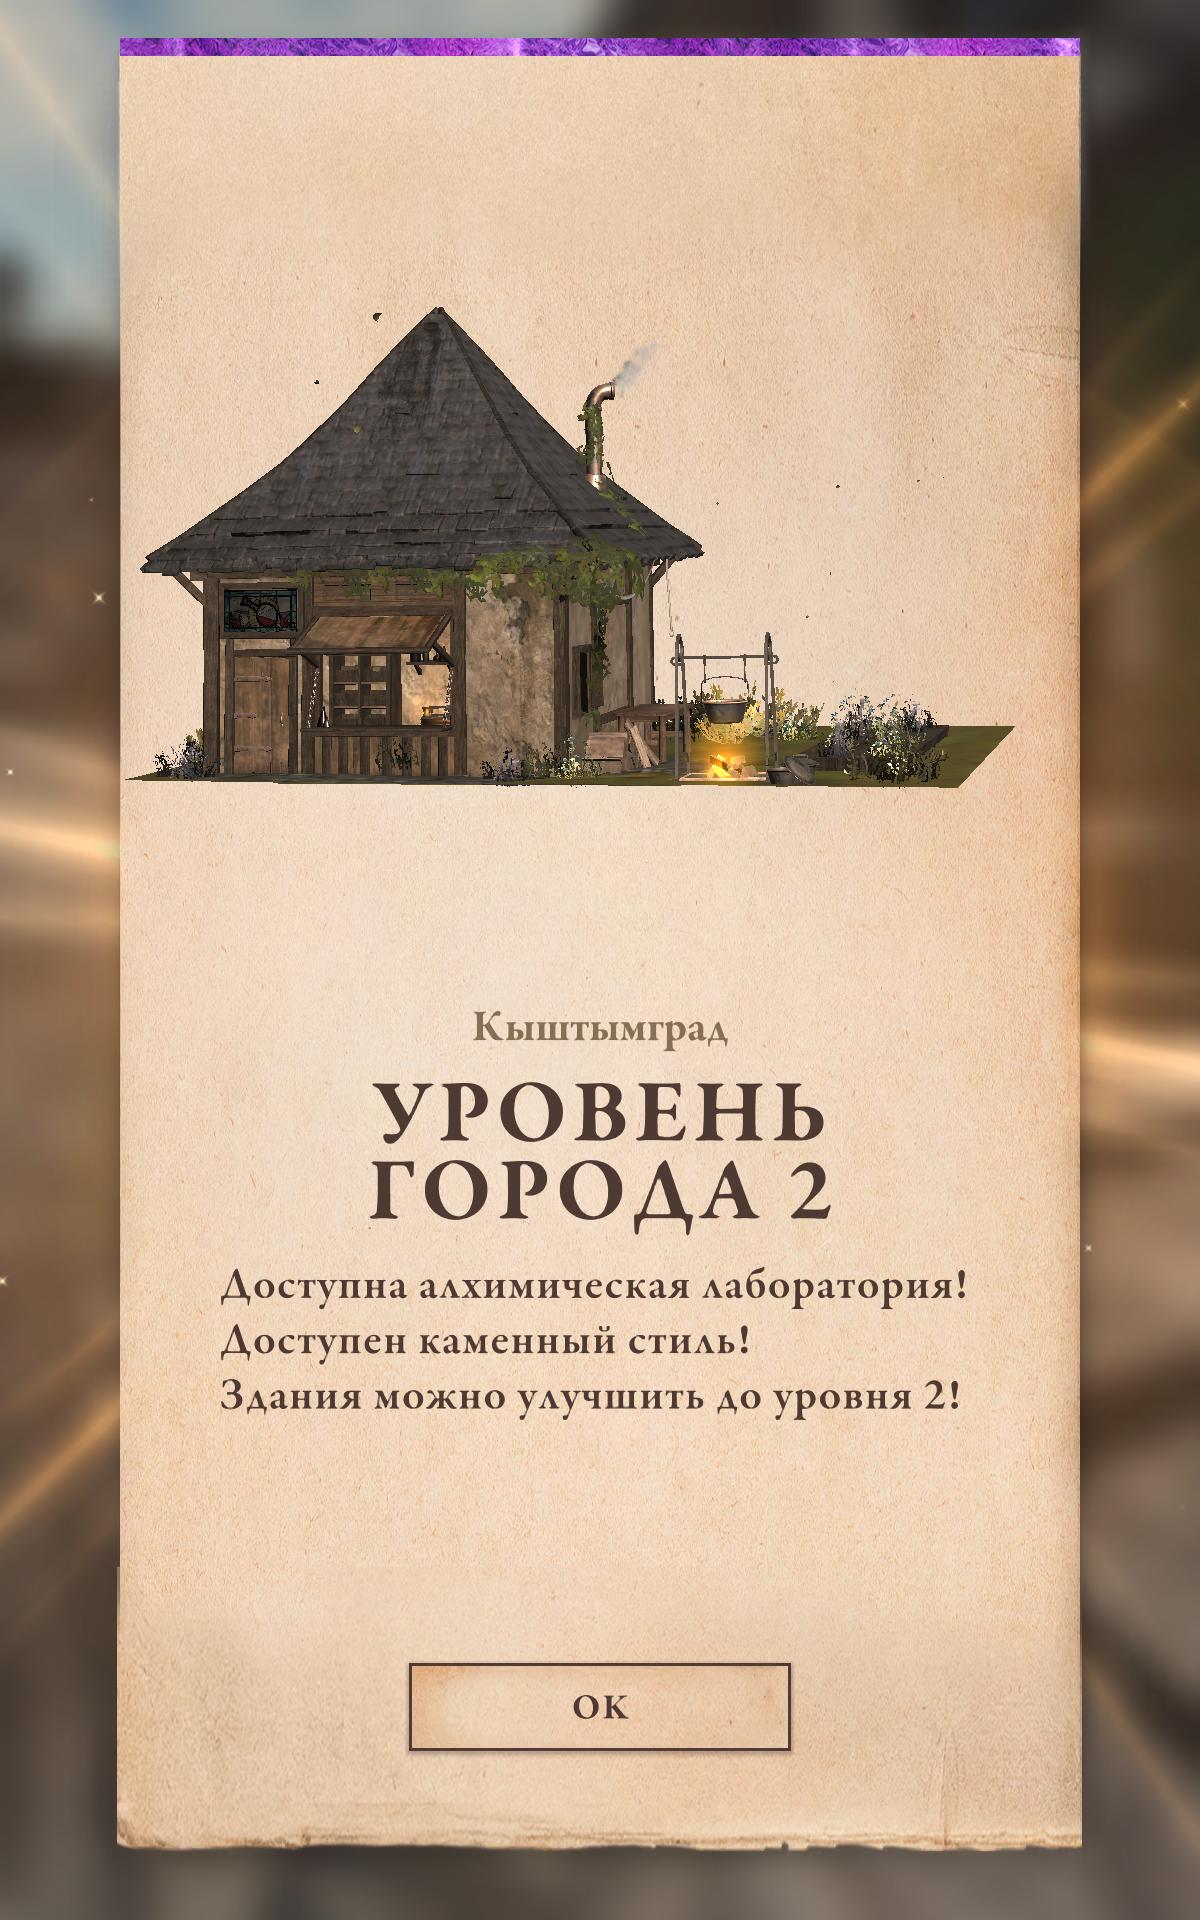 http://s3.uploads.ru/DlHkN.png